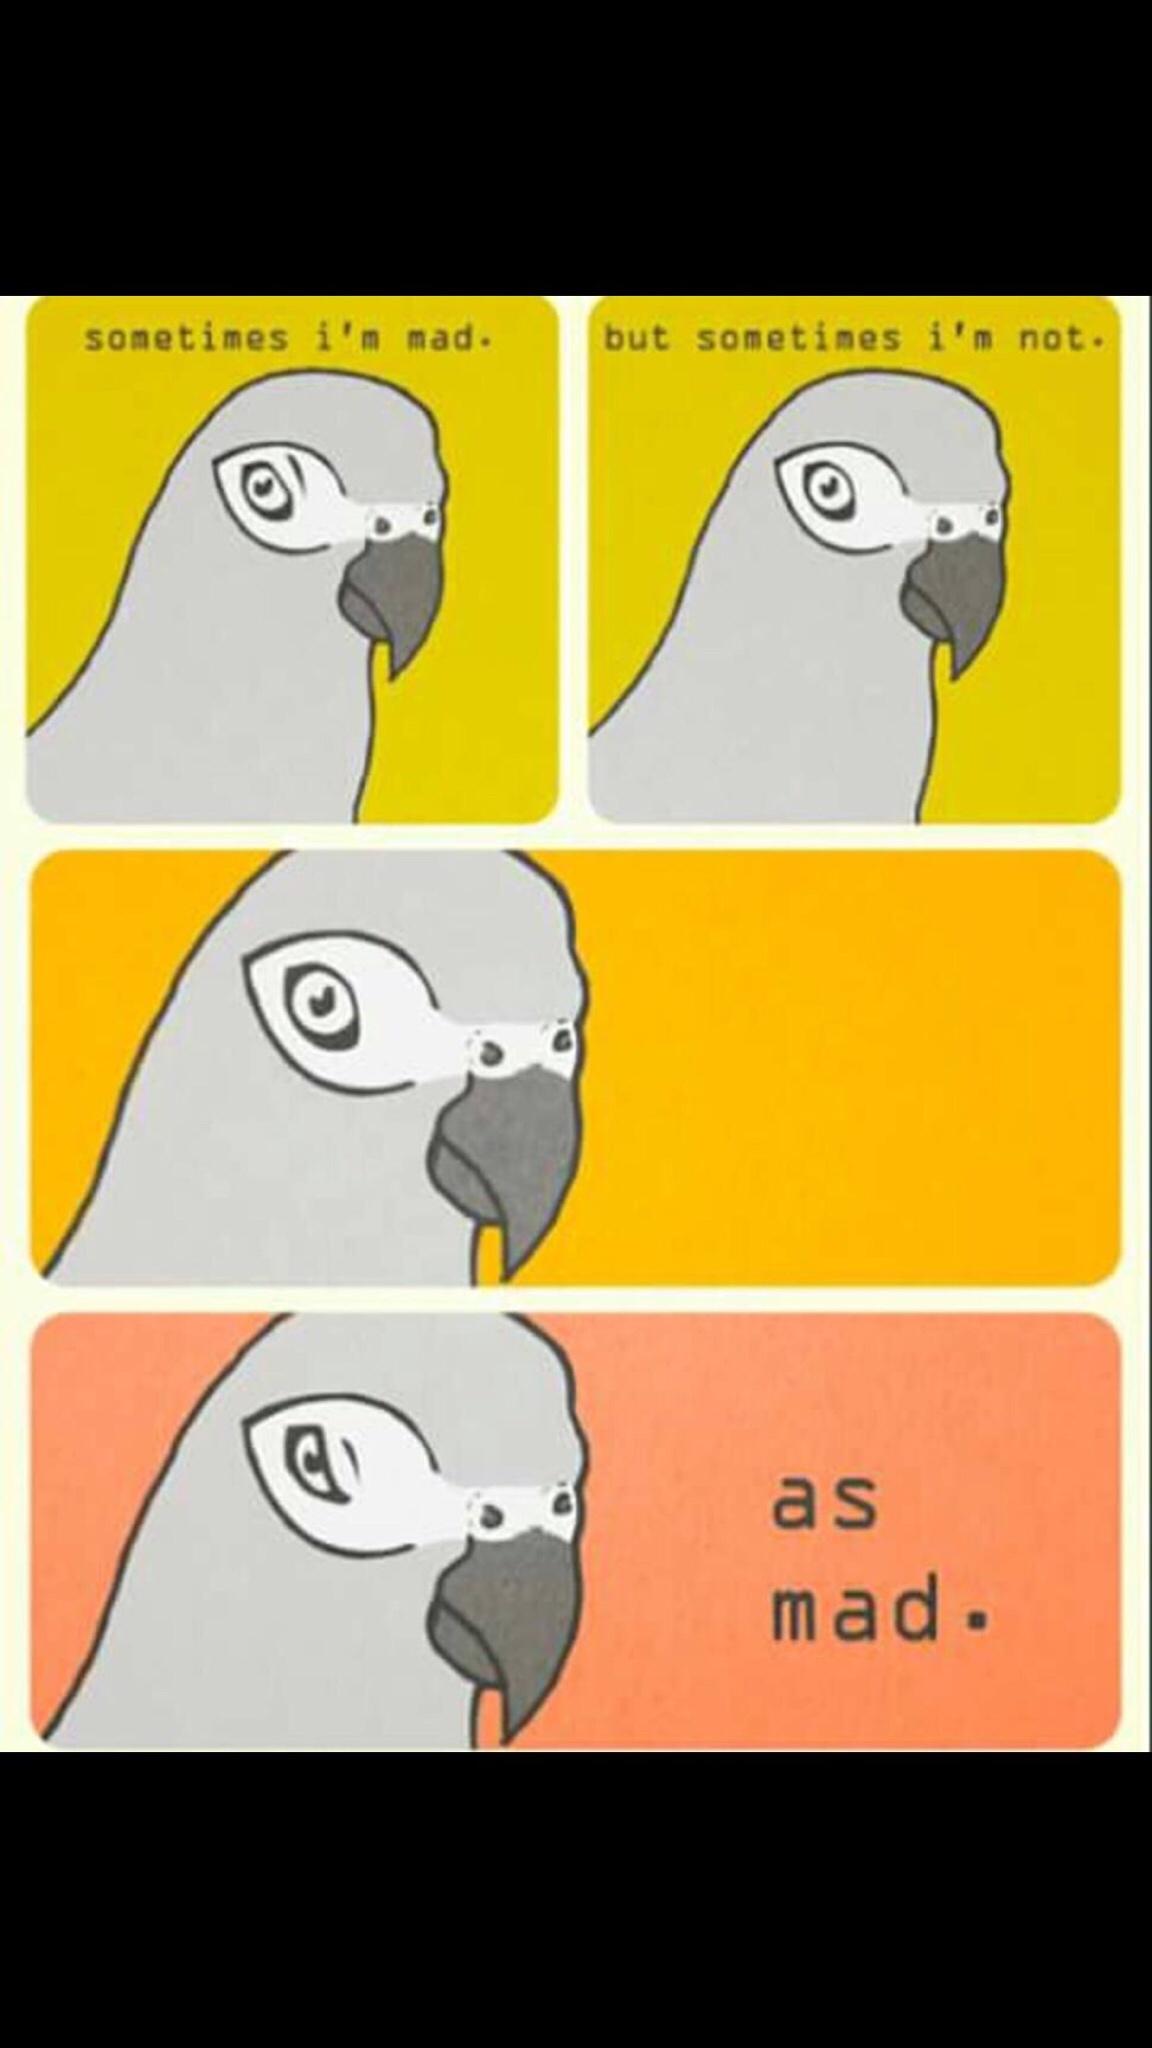 38 Funny AF Memes And More - Gallery | eBaums World